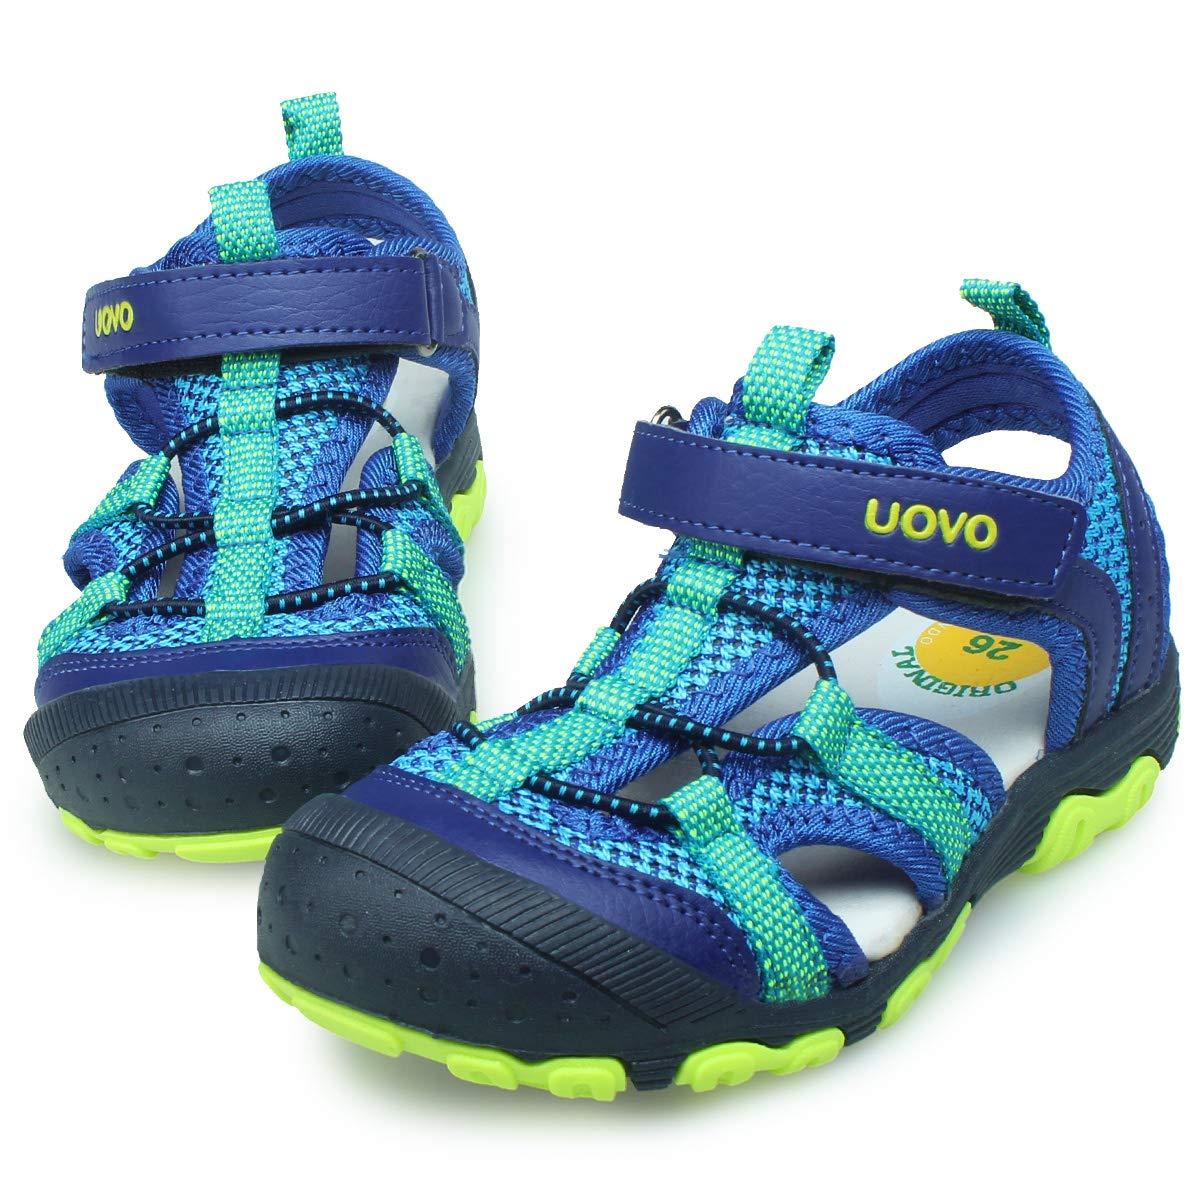 UOVO Kids Boys Sandals Toddler Little Boys Closed Toe Athletic Sport Sandals Hiking Outdoor Summer Sandals (3 M US Little Kid, Loyal Blue)